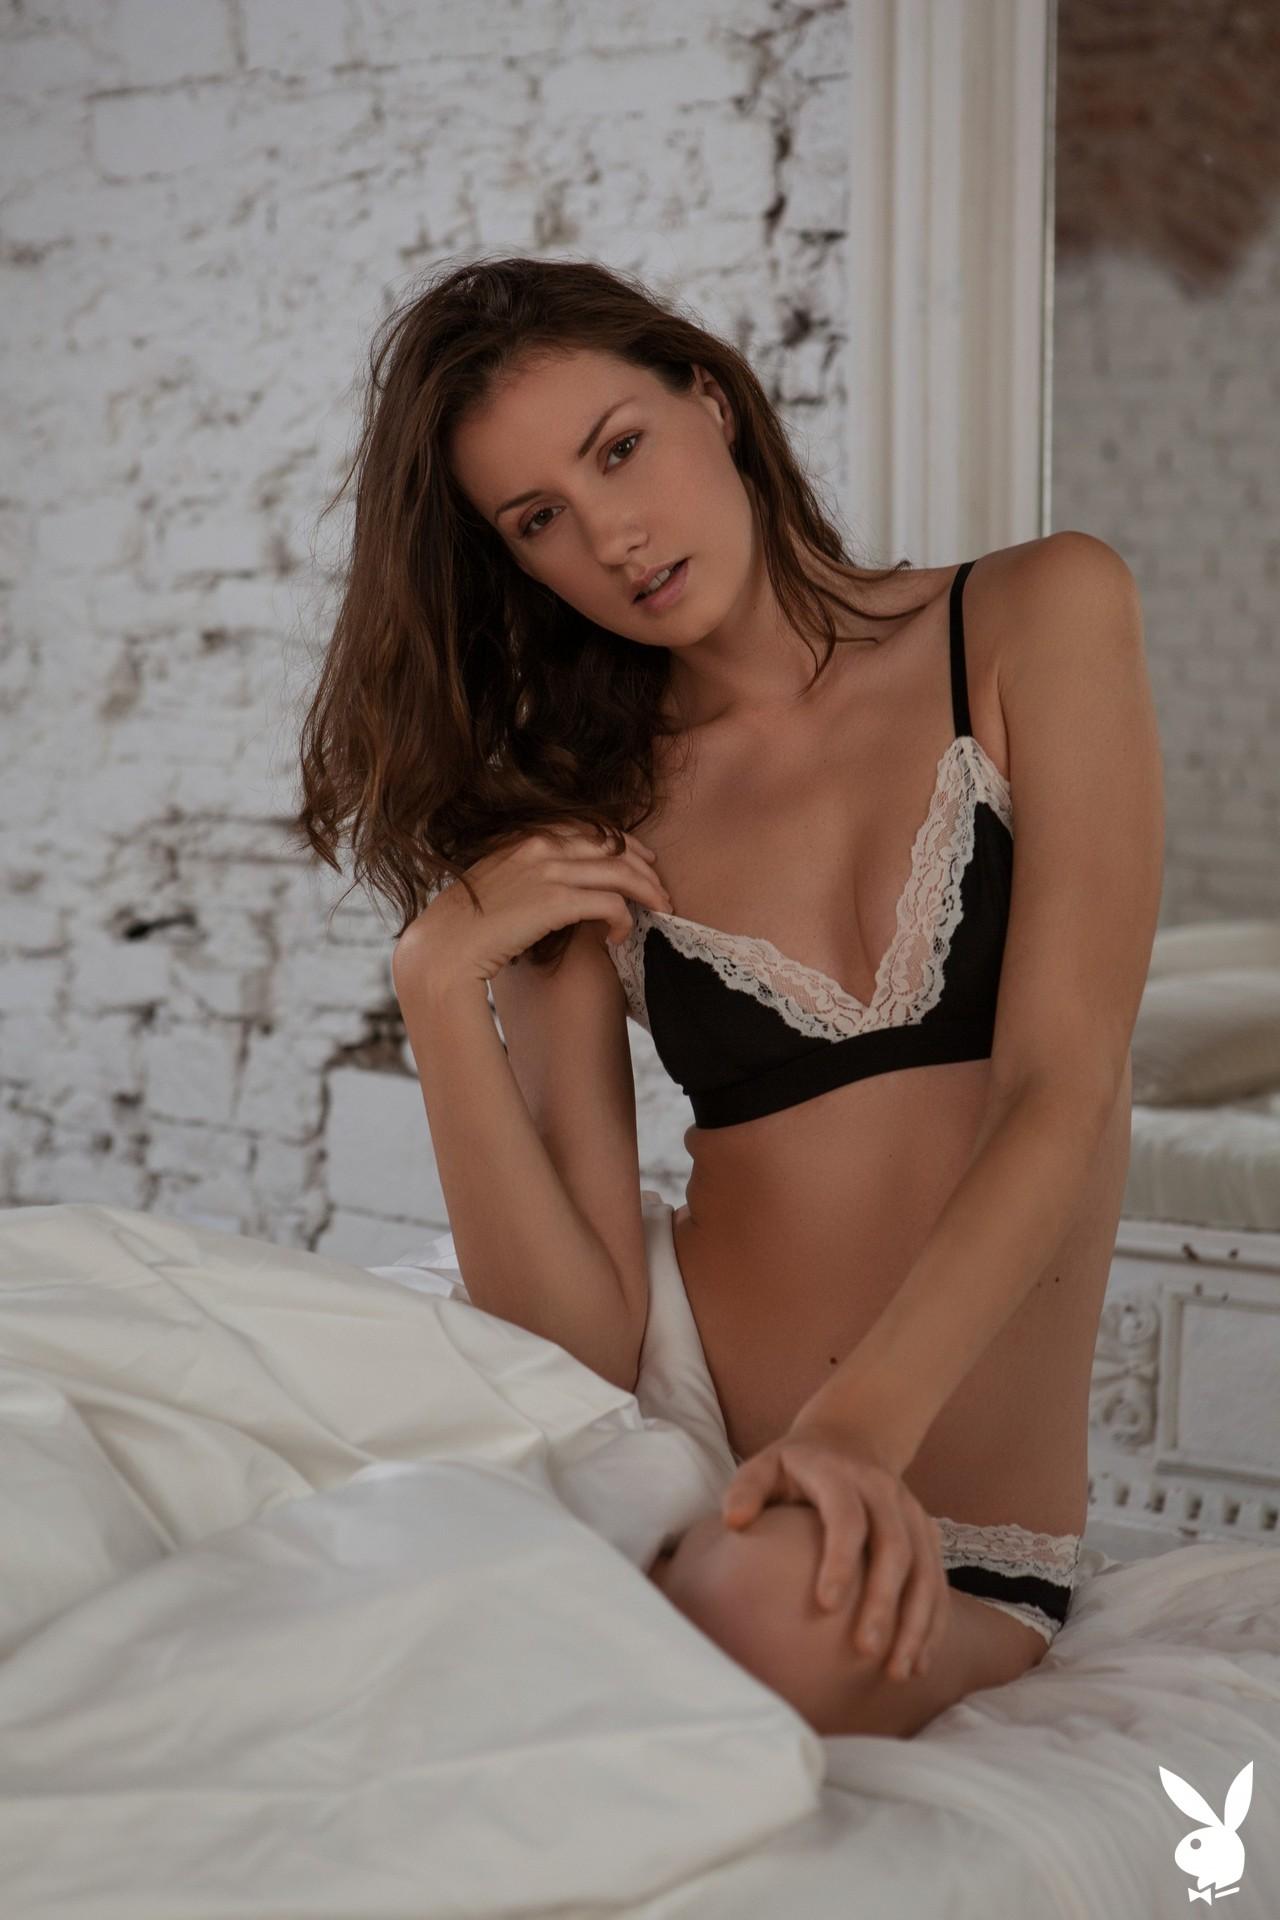 Mikaela Mckenna In Early Awakening Playboy Plus (1)